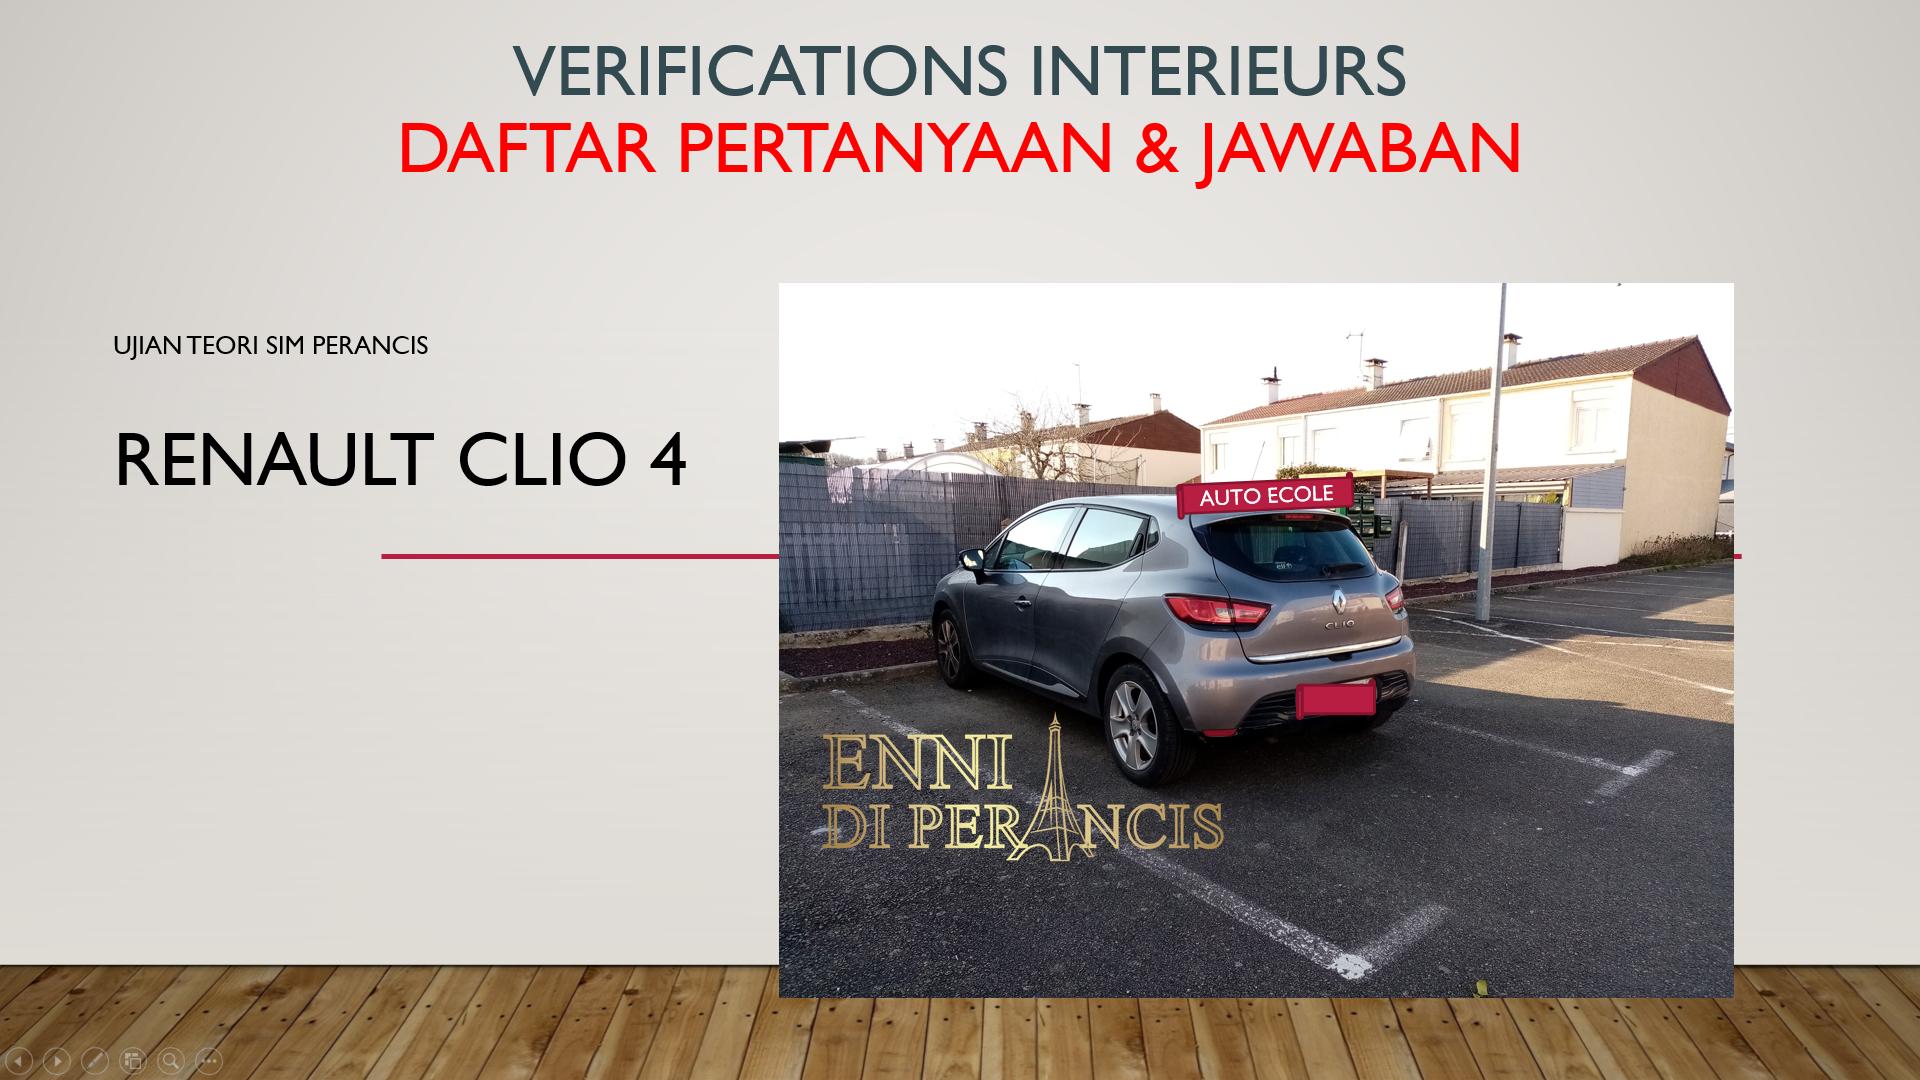 VERIFICATION INTERIEUR DAFTAR PERTANYAAN DAN JAWABAN UJIAN SIM PERANCIS